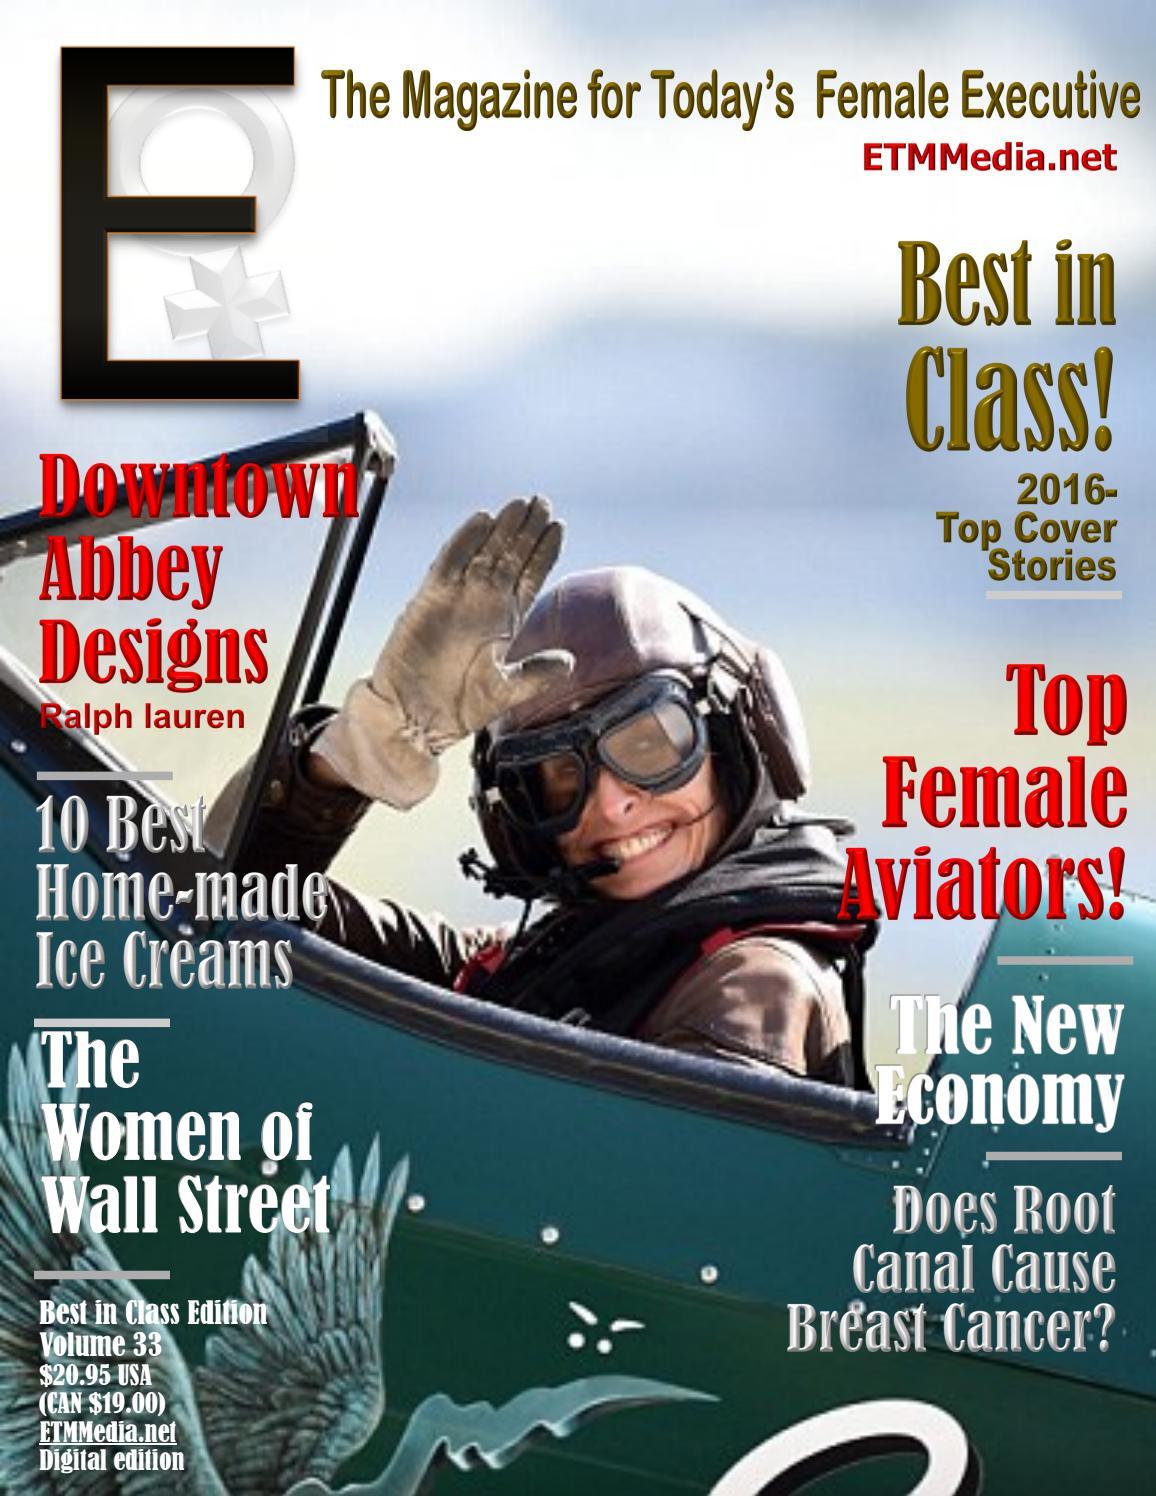 87143f486a64 E The Magazine for Today s Female Executive best in class 2017 volume 33 by  E The Magazine for Today s Female Executive. An ETM Media Publication -  issuu